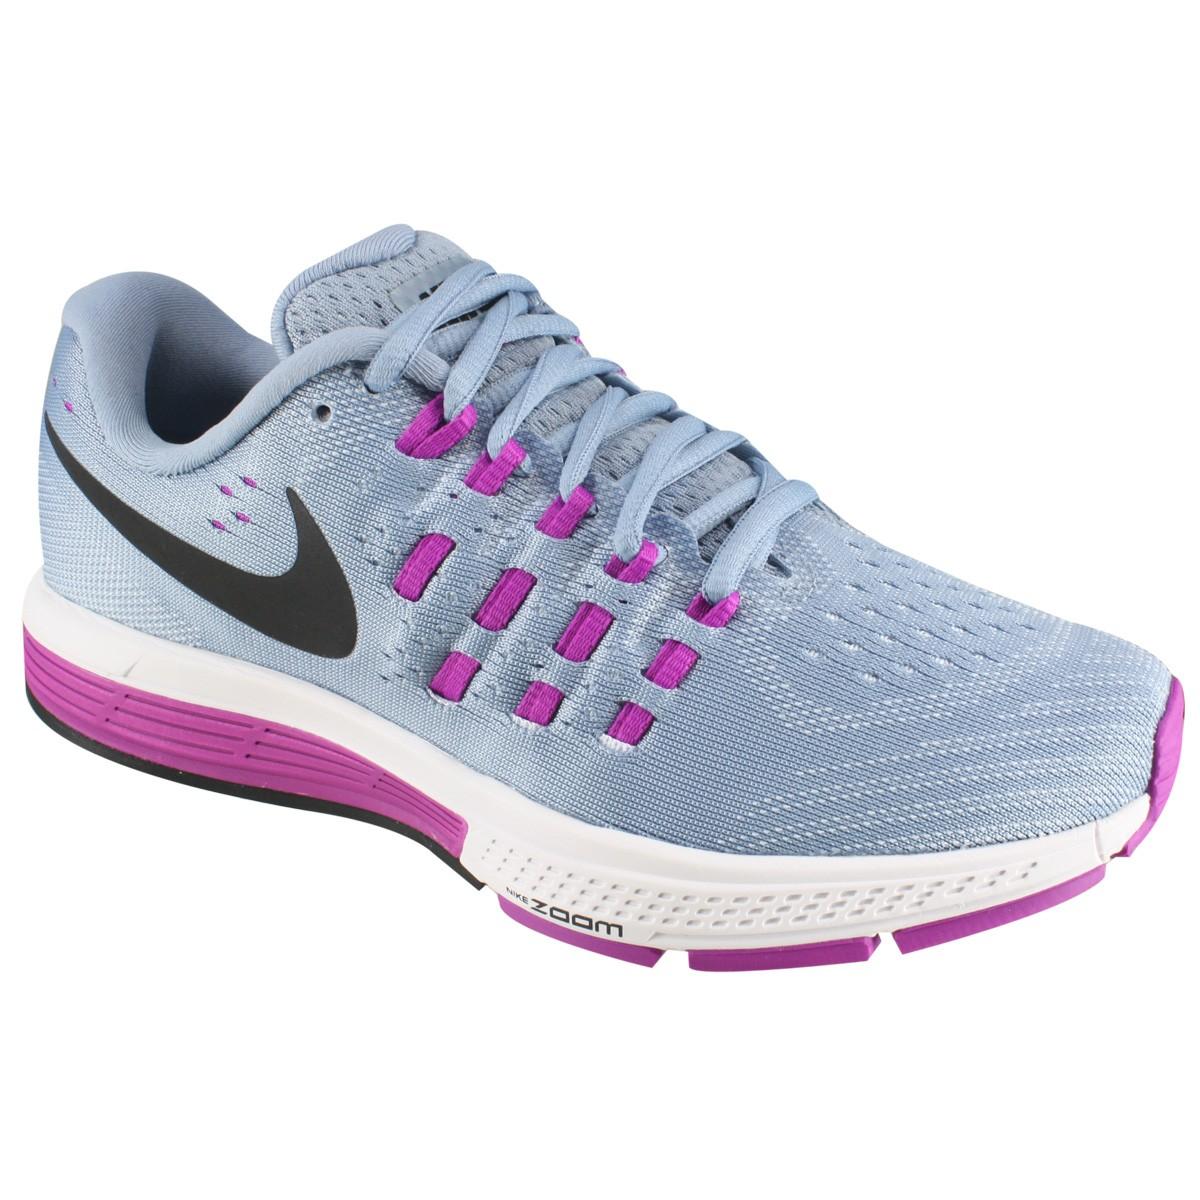 5121091f3bf Tênis Nike Air Zoom Vomero 11 818100-405 Grafite Roxo